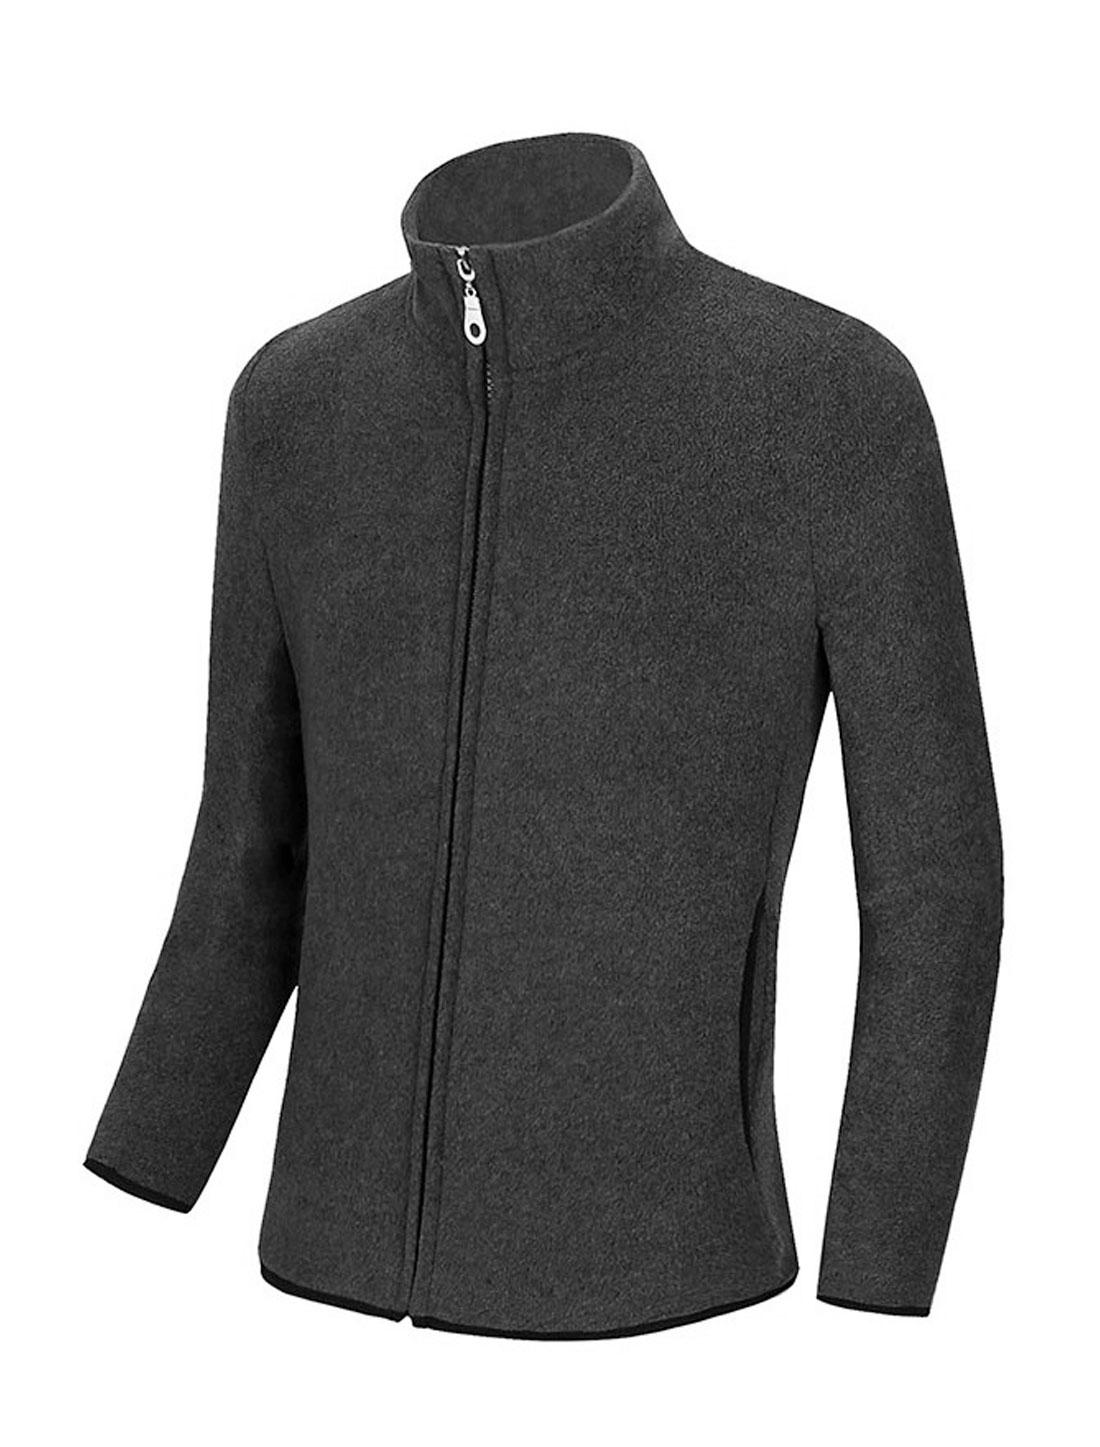 Men Long Sleeve Stand Collar Zip Closed Fleece Jackets Dark Gray M